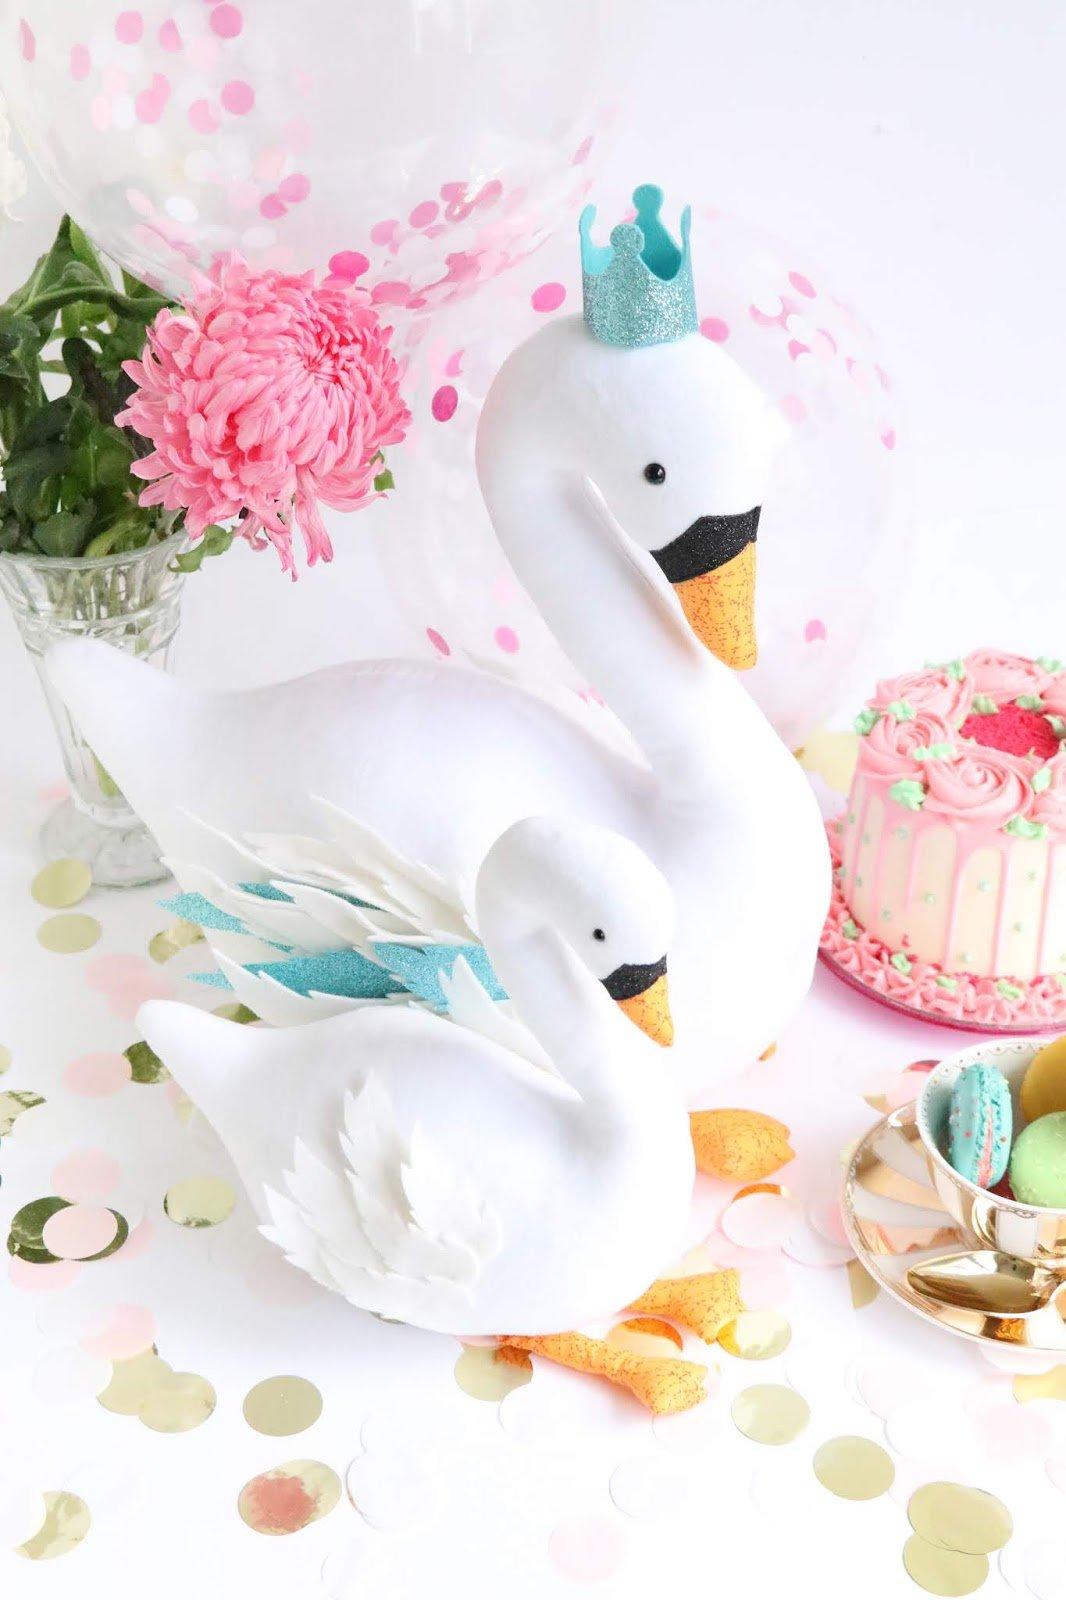 Ric Rac - Swan Party Pattern